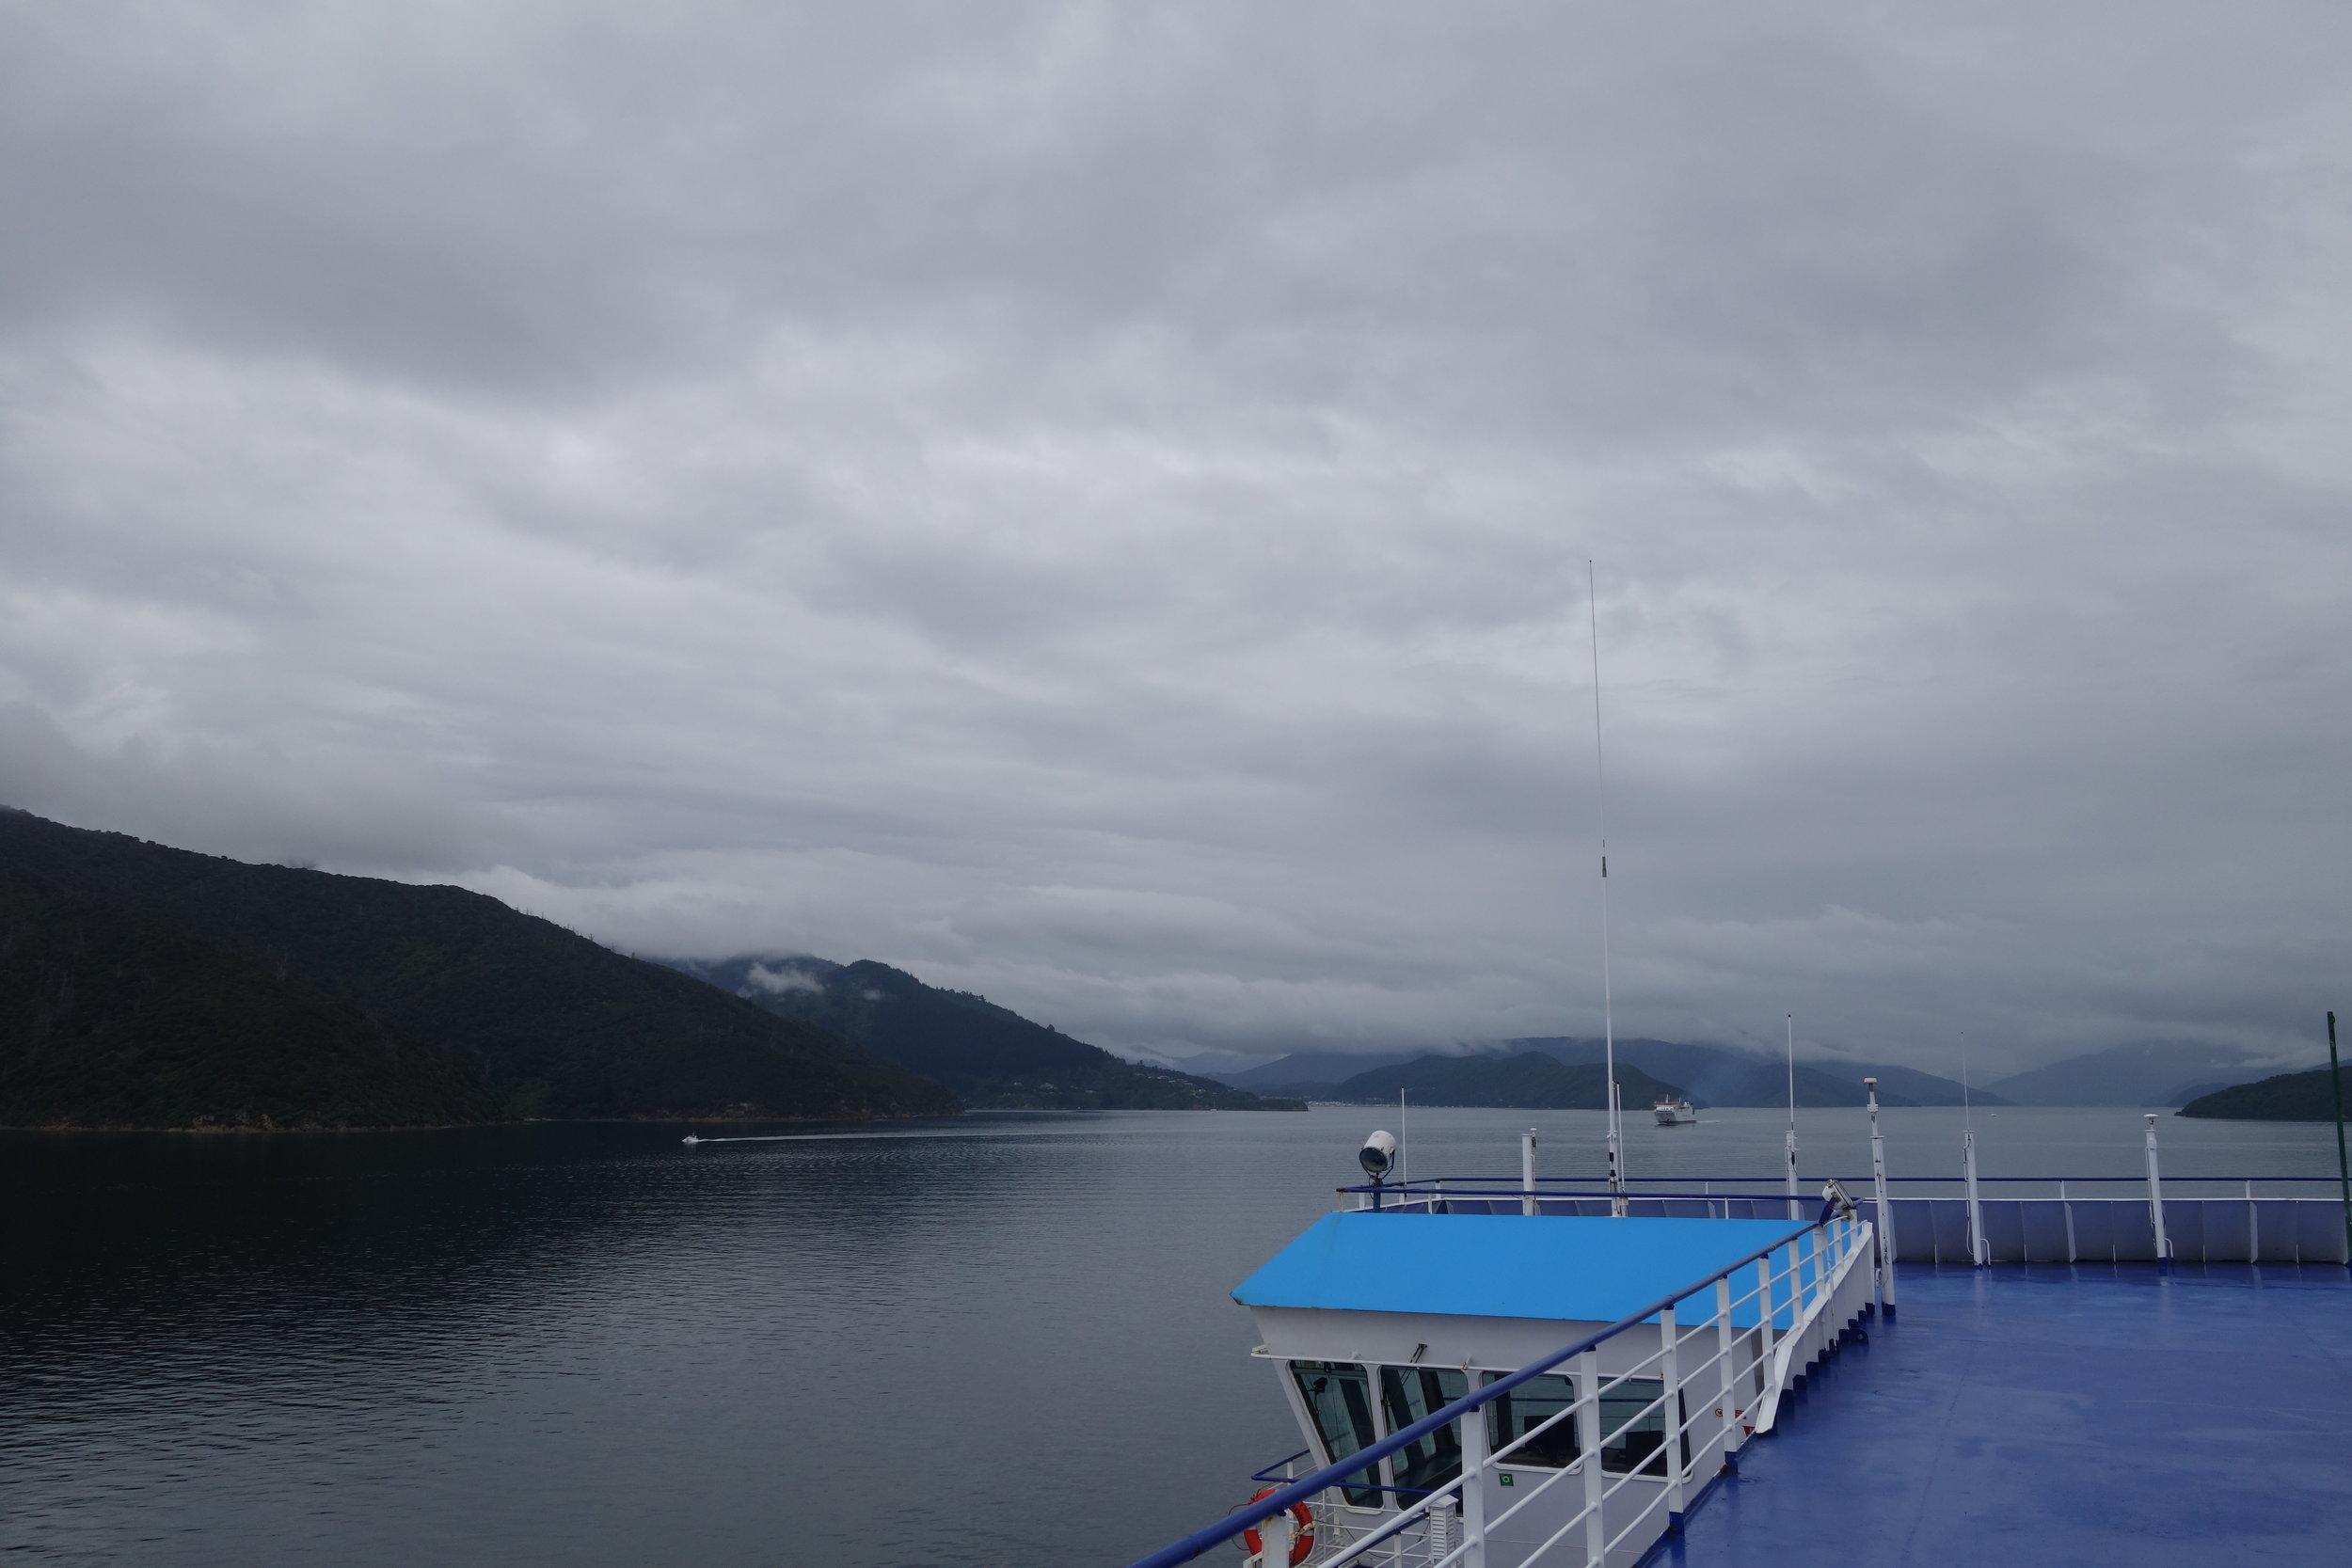 Heading into the Malborough Sounds. Oh shit, looks like rain. Top deck with Bluebridge